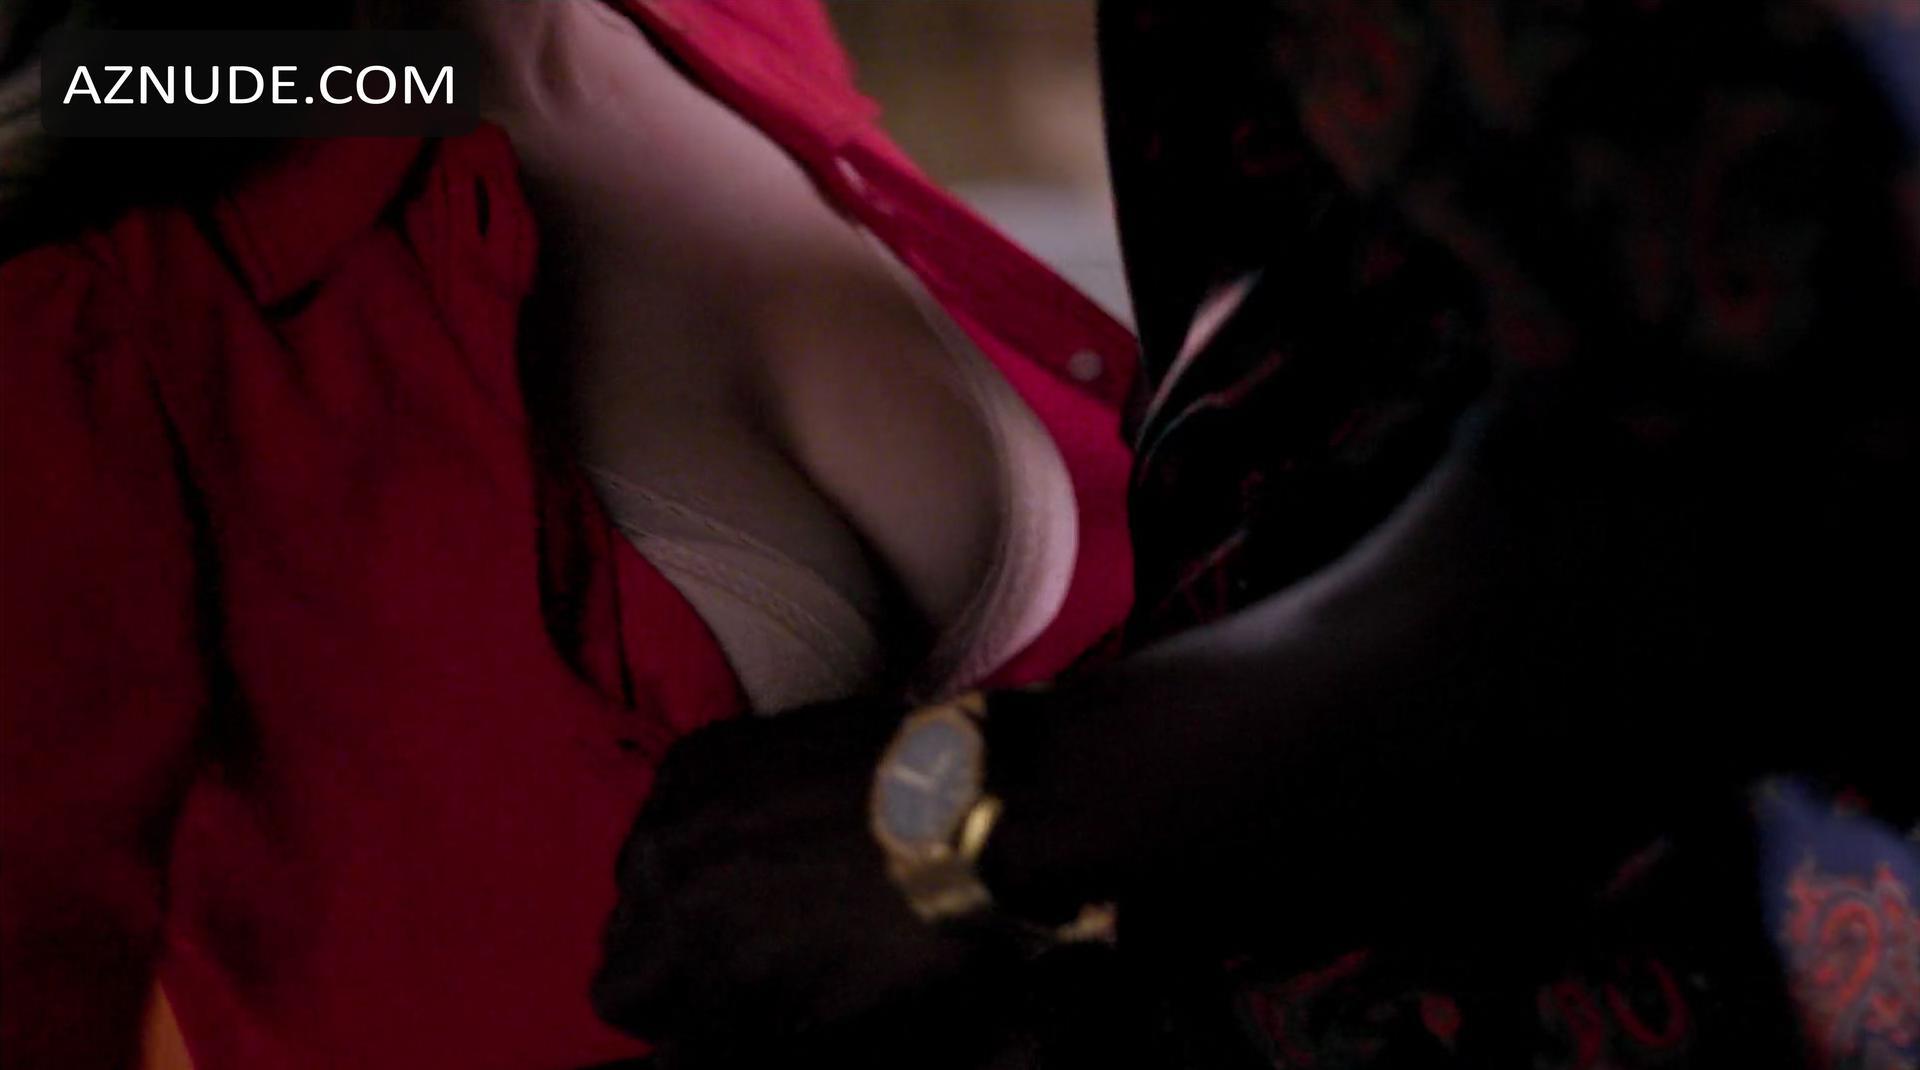 Remarkable, elizabeth gillies nude